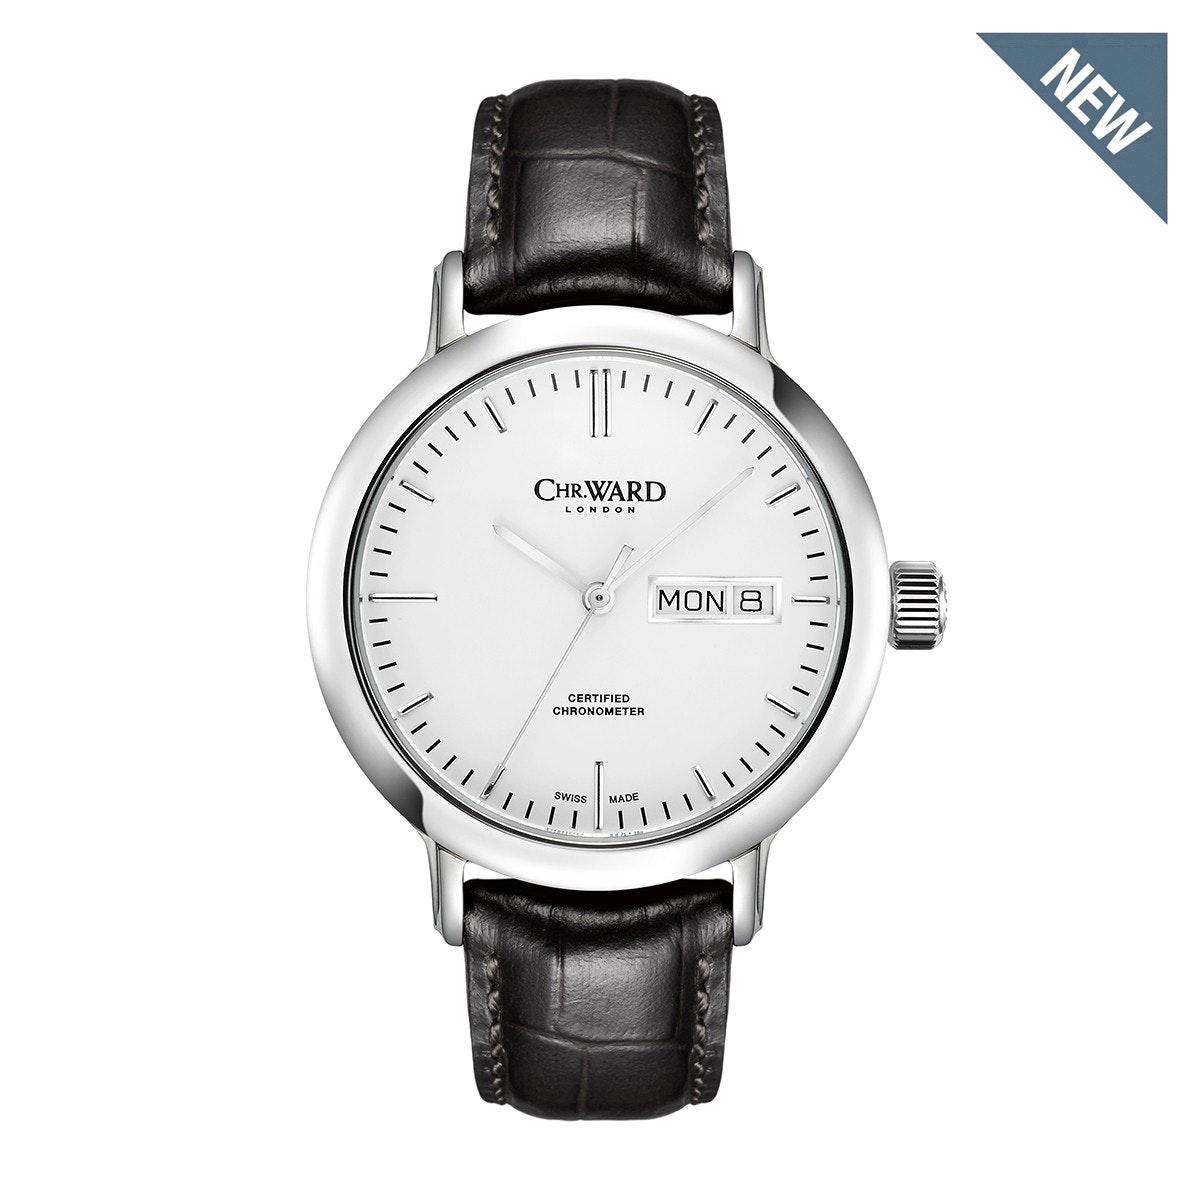 Christoper Ward - C50 Malvern Chronometer Limited Edition